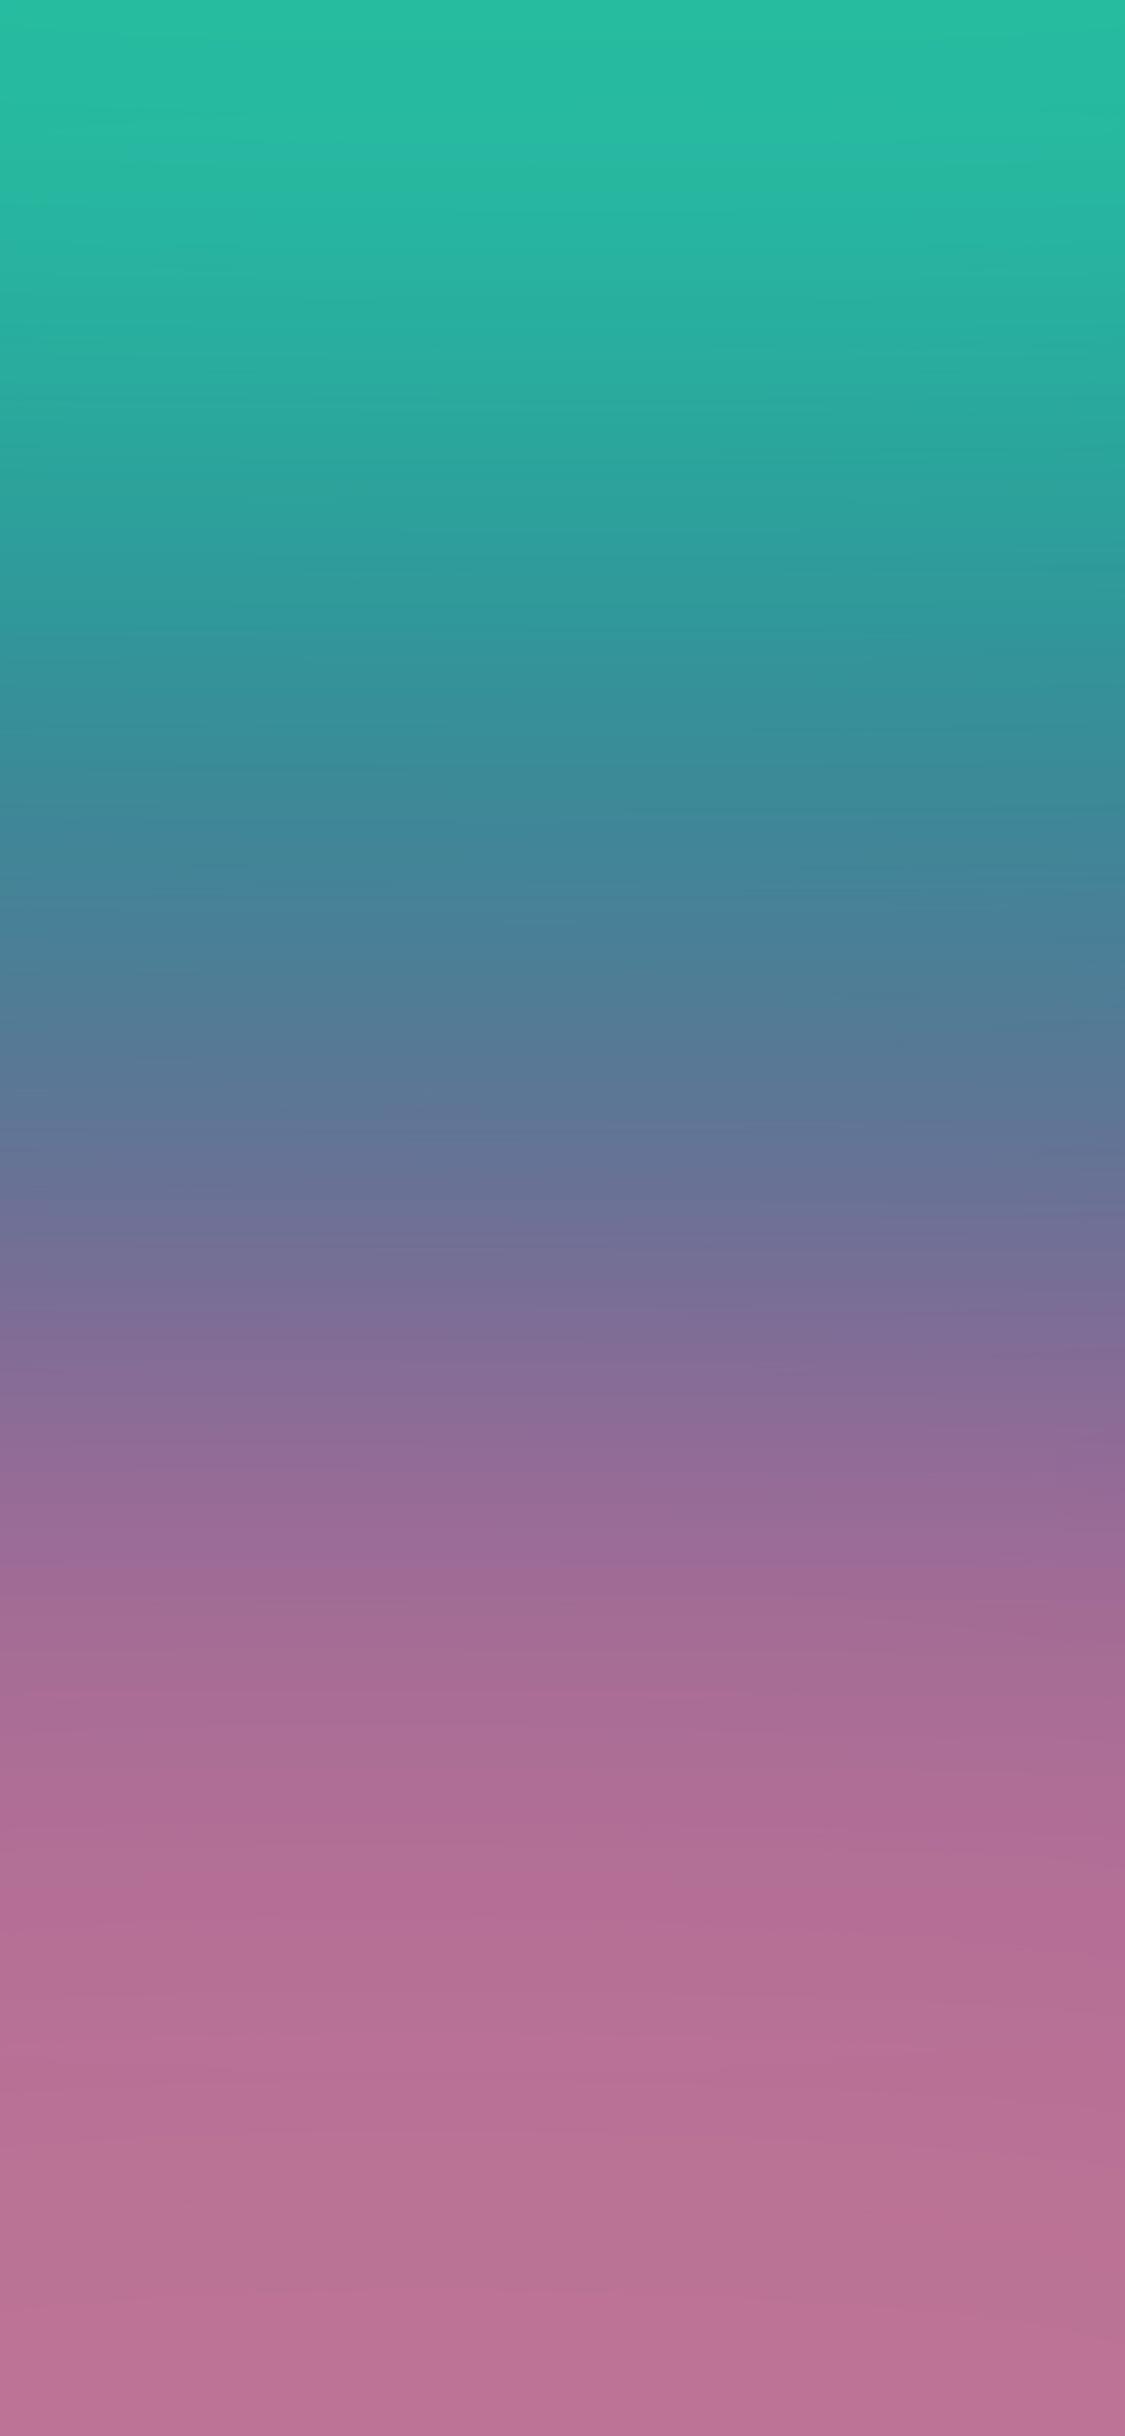 Sh34 First Sex High Pink Green Gradation Blur Papers Co